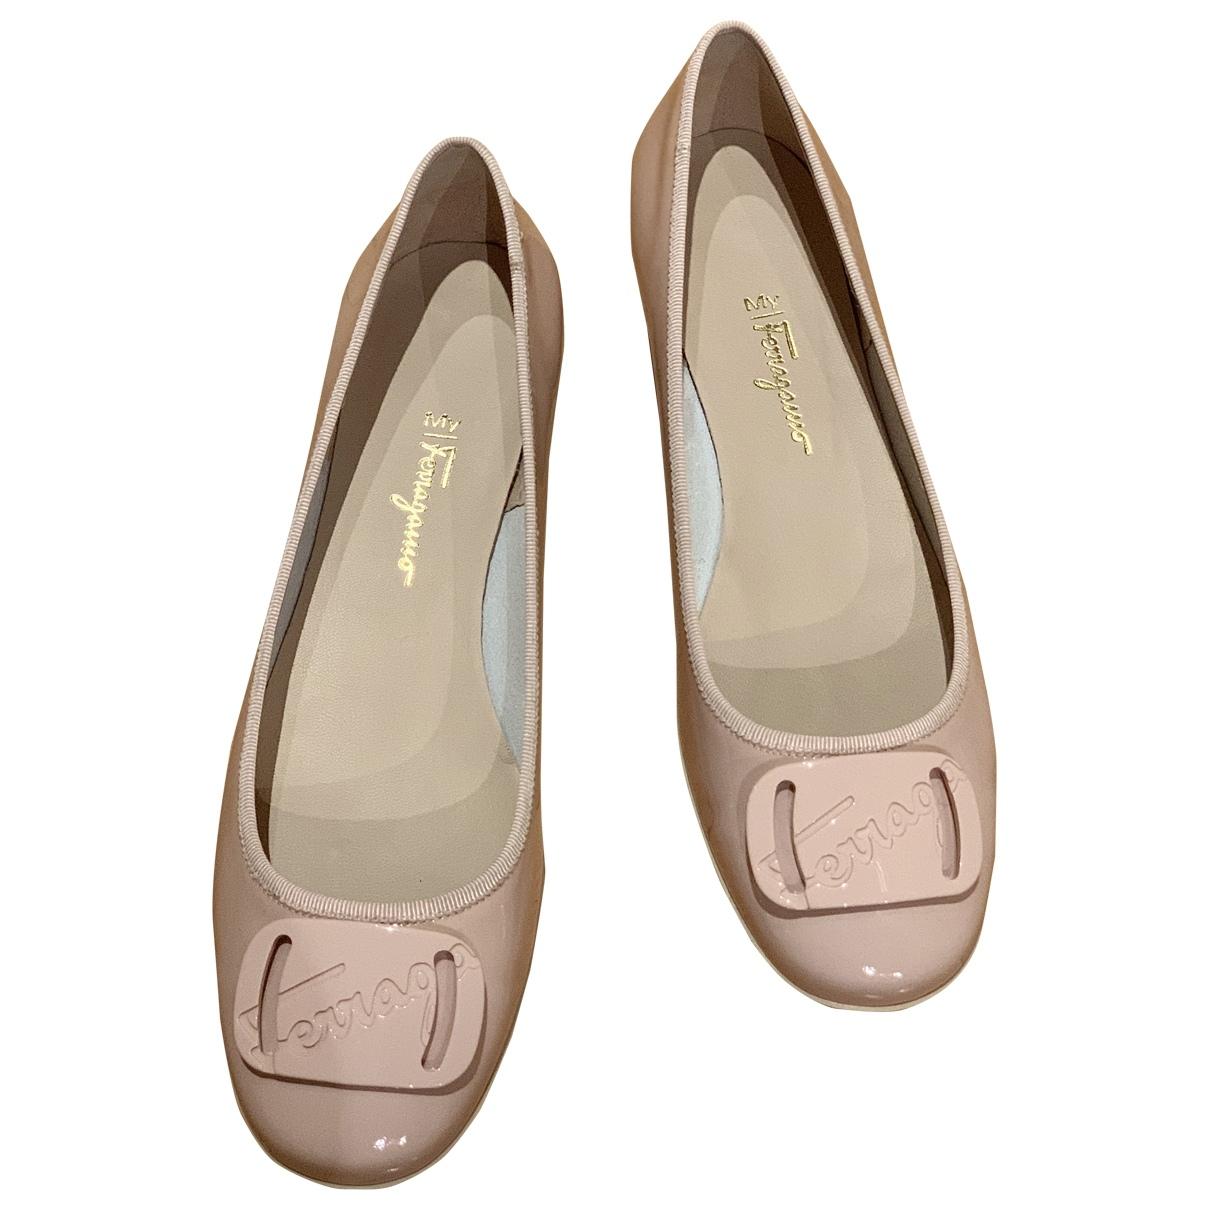 Salvatore Ferragamo \N Patent leather Ballet flats for Women 42 EU